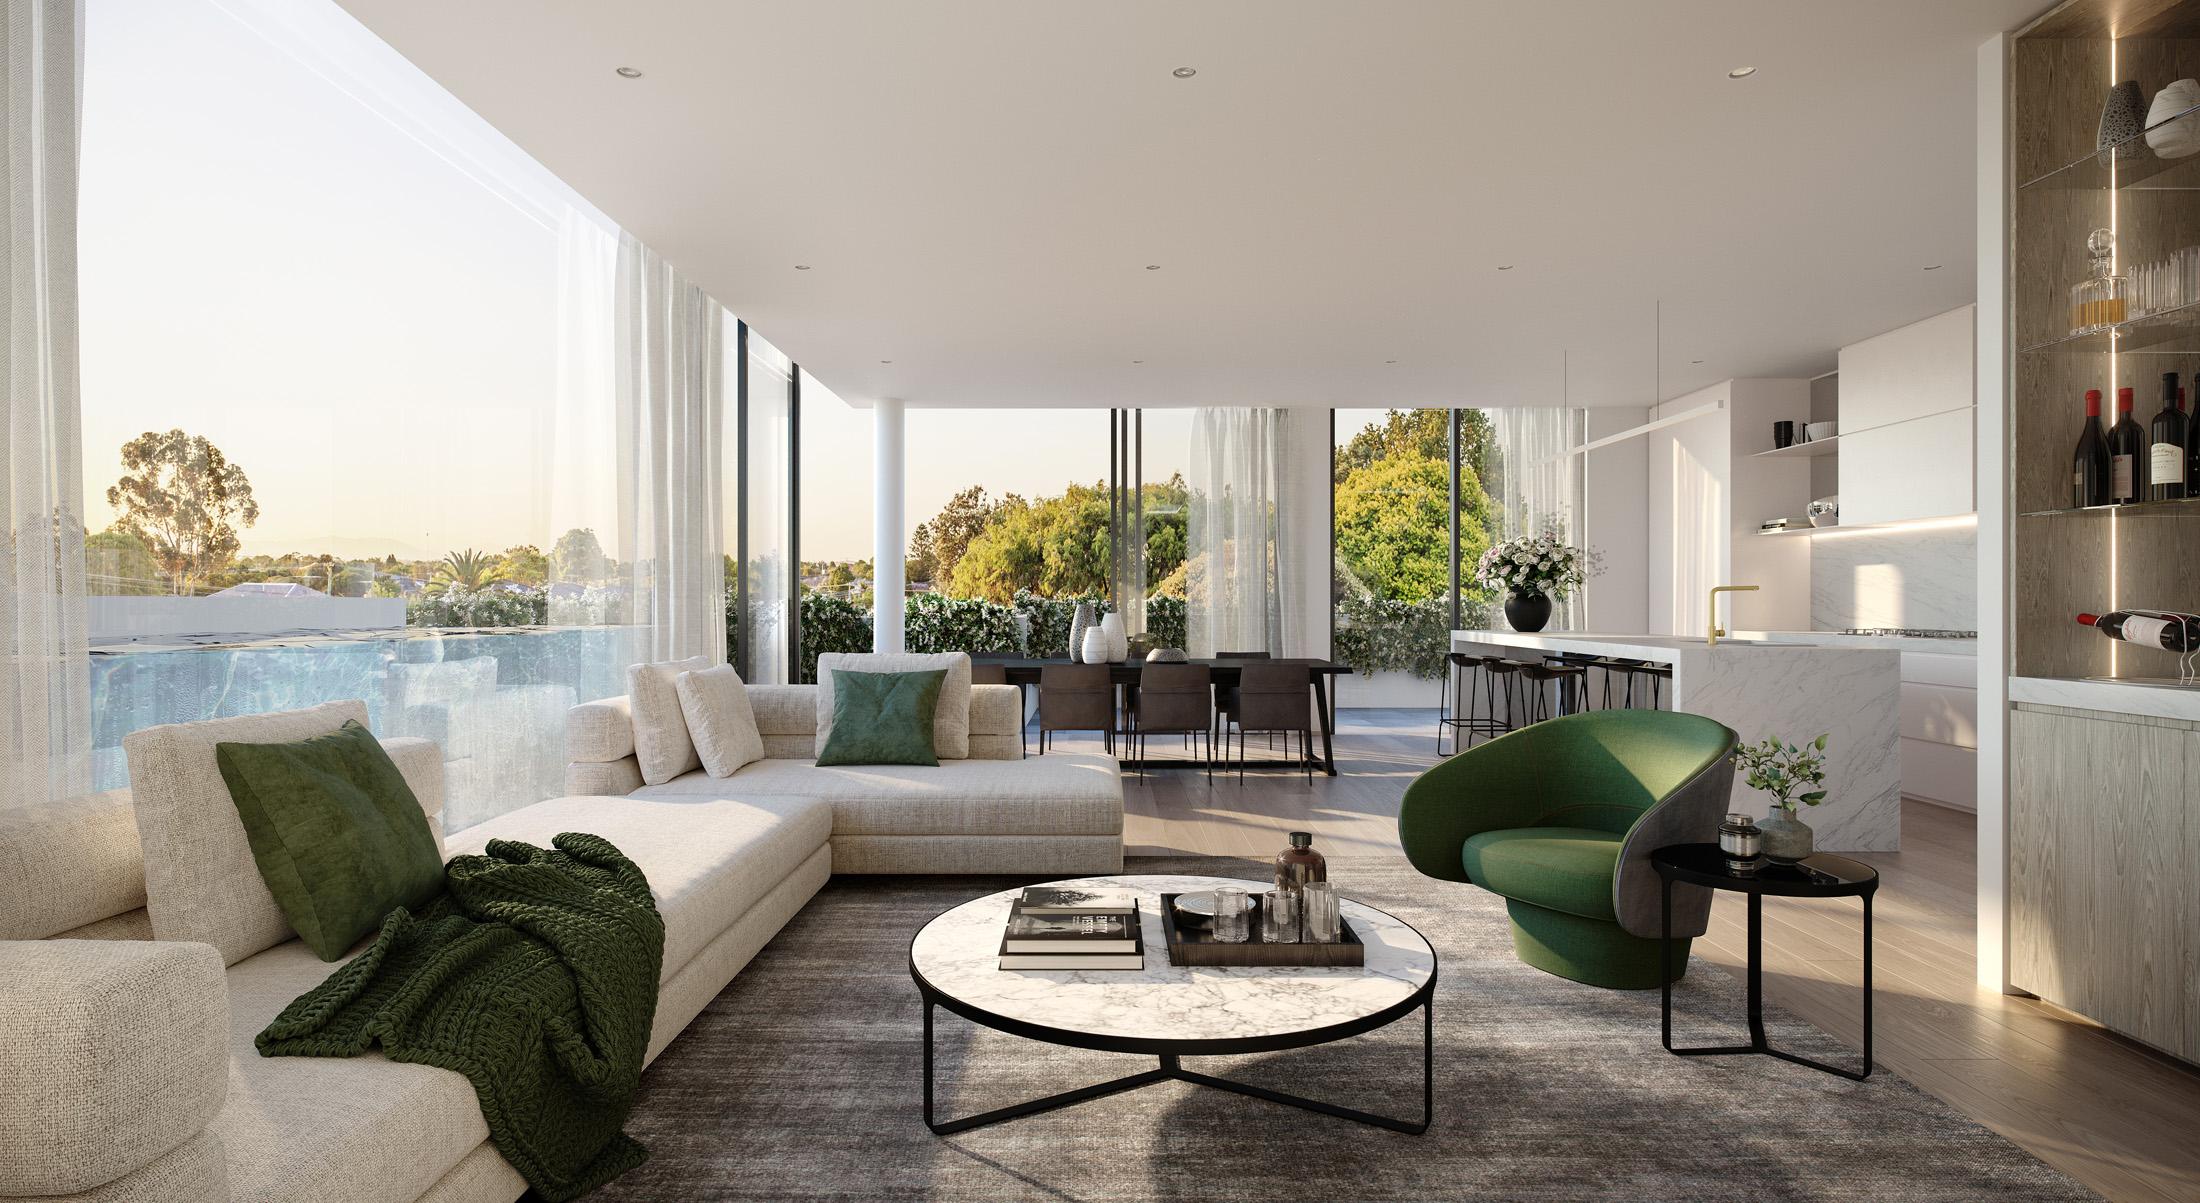 Trentham-interior-livingroom-sandringham-Melbourne-3d-image-visualisation